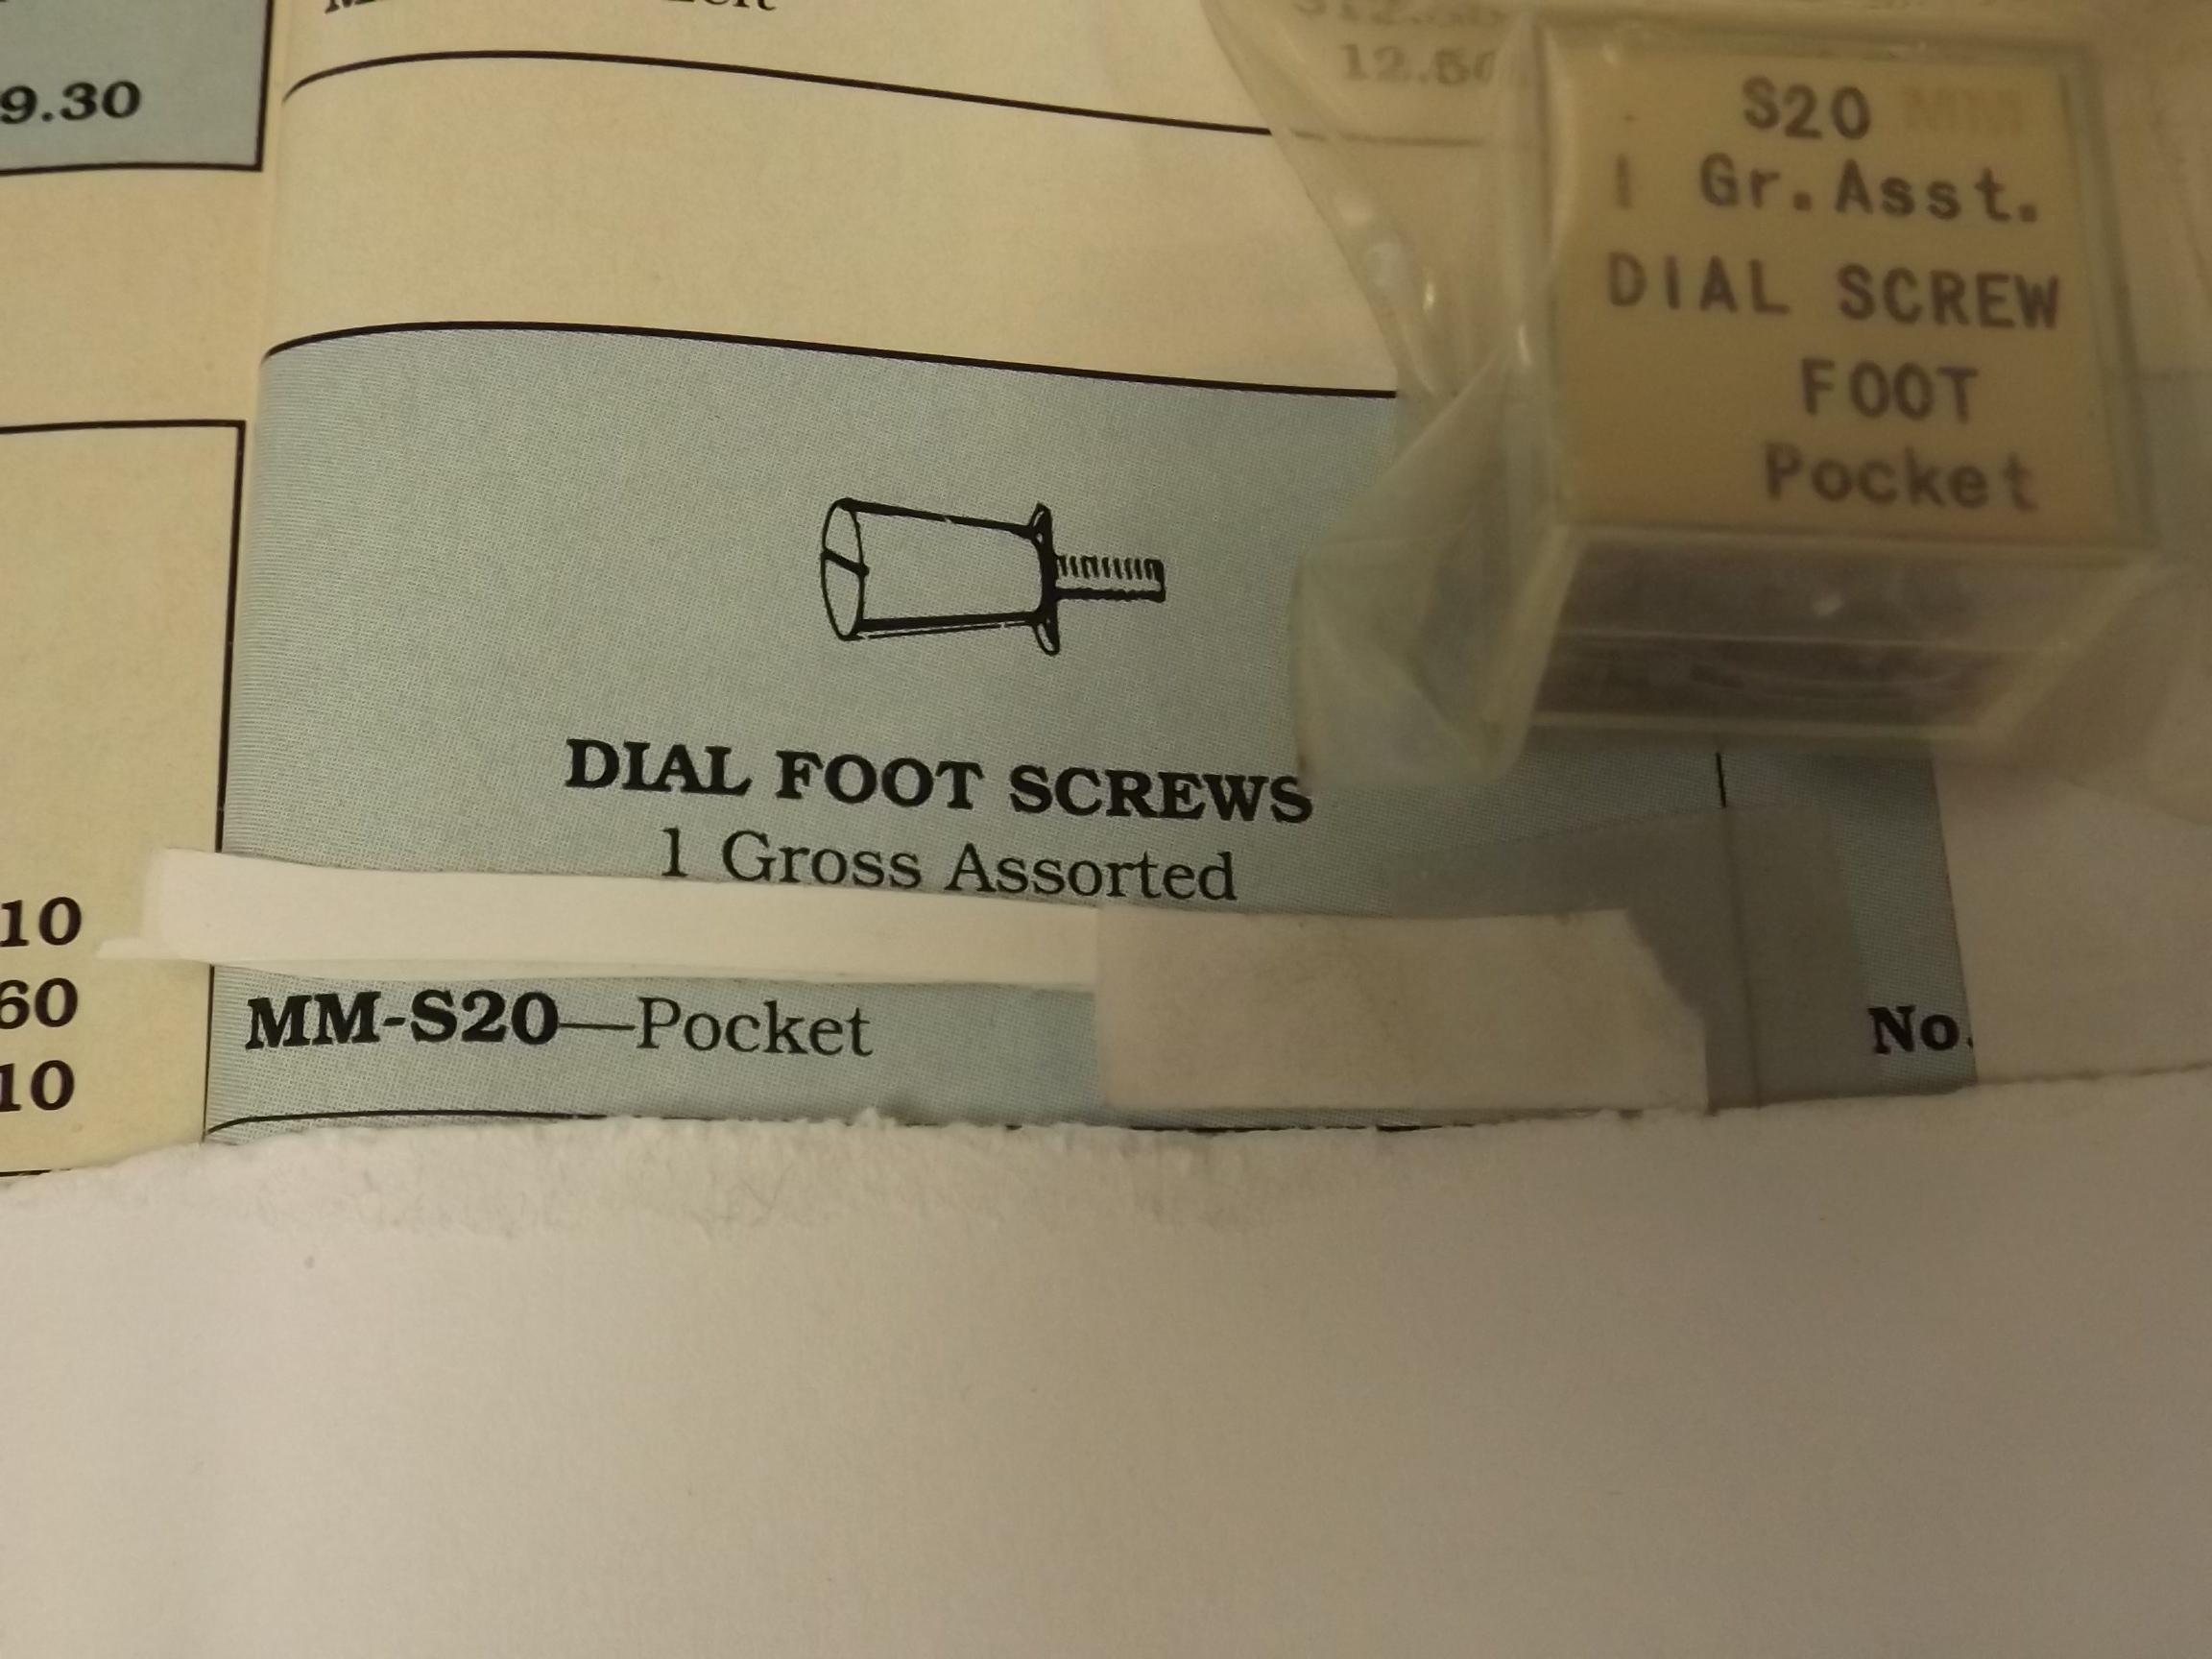 MM-S20 Dial Foot Screws, Pocket- 1 Gross- Bestfit- Three Only!